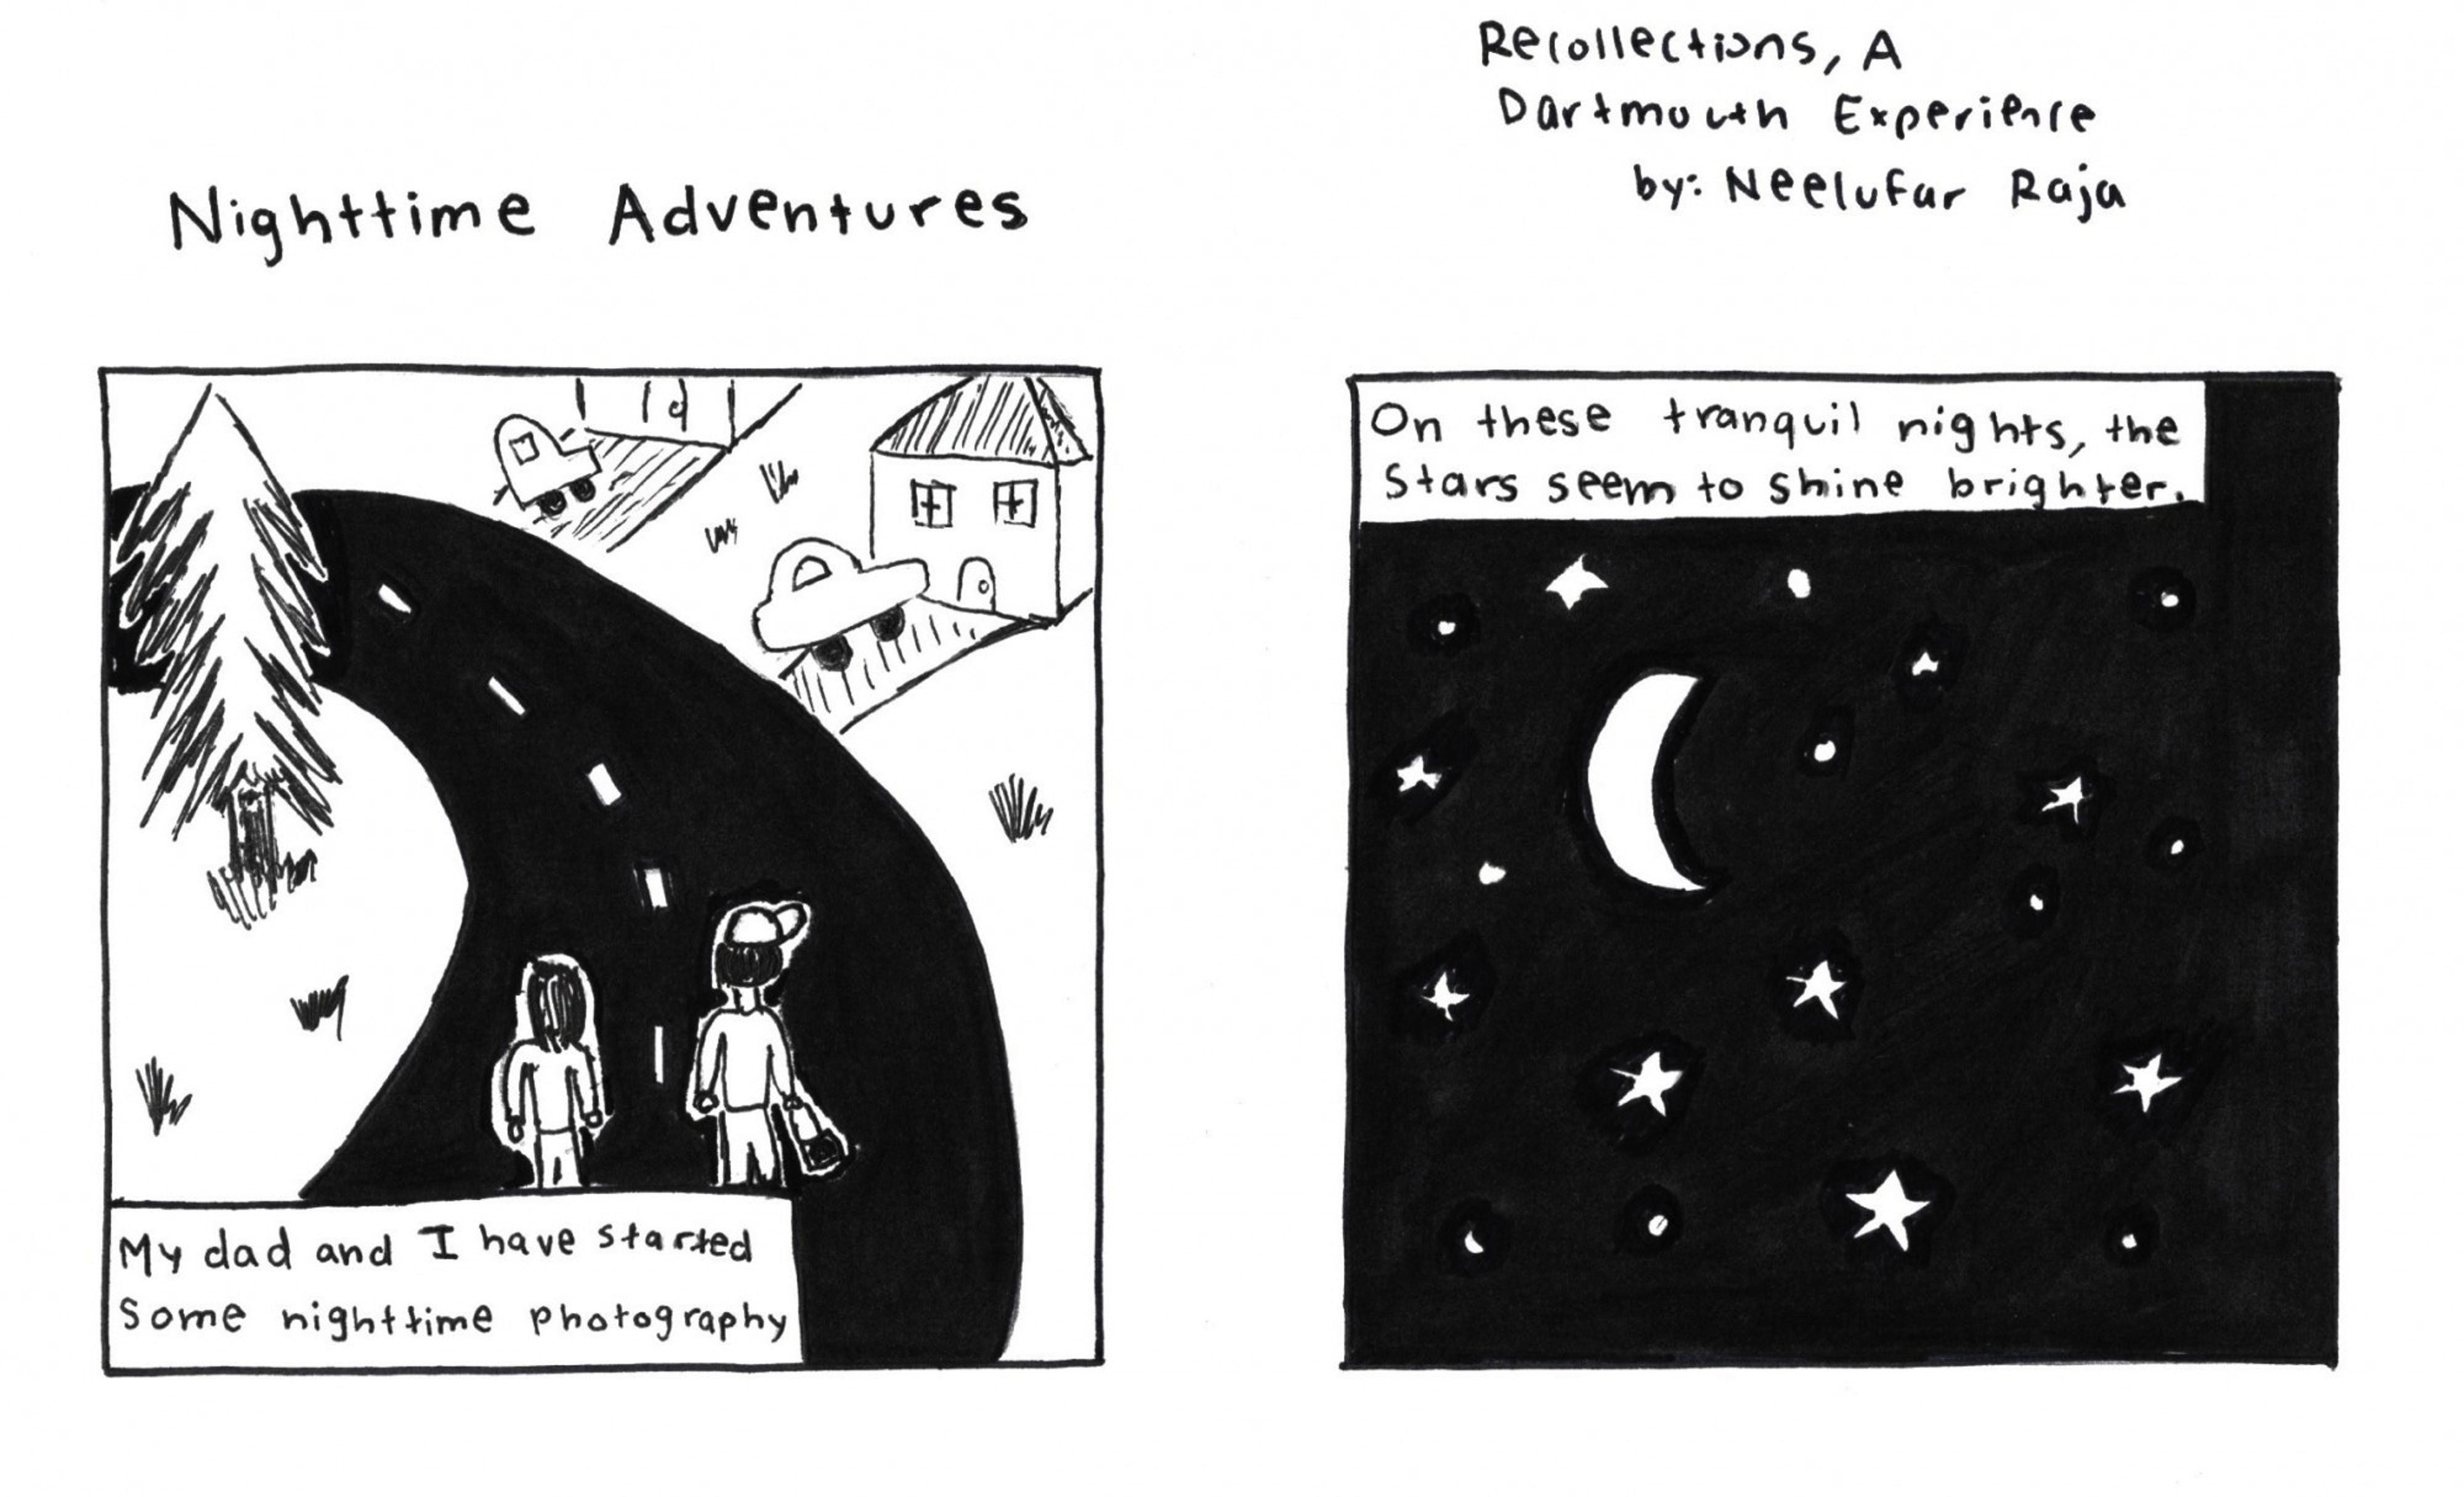 raja-nighttime-adventures